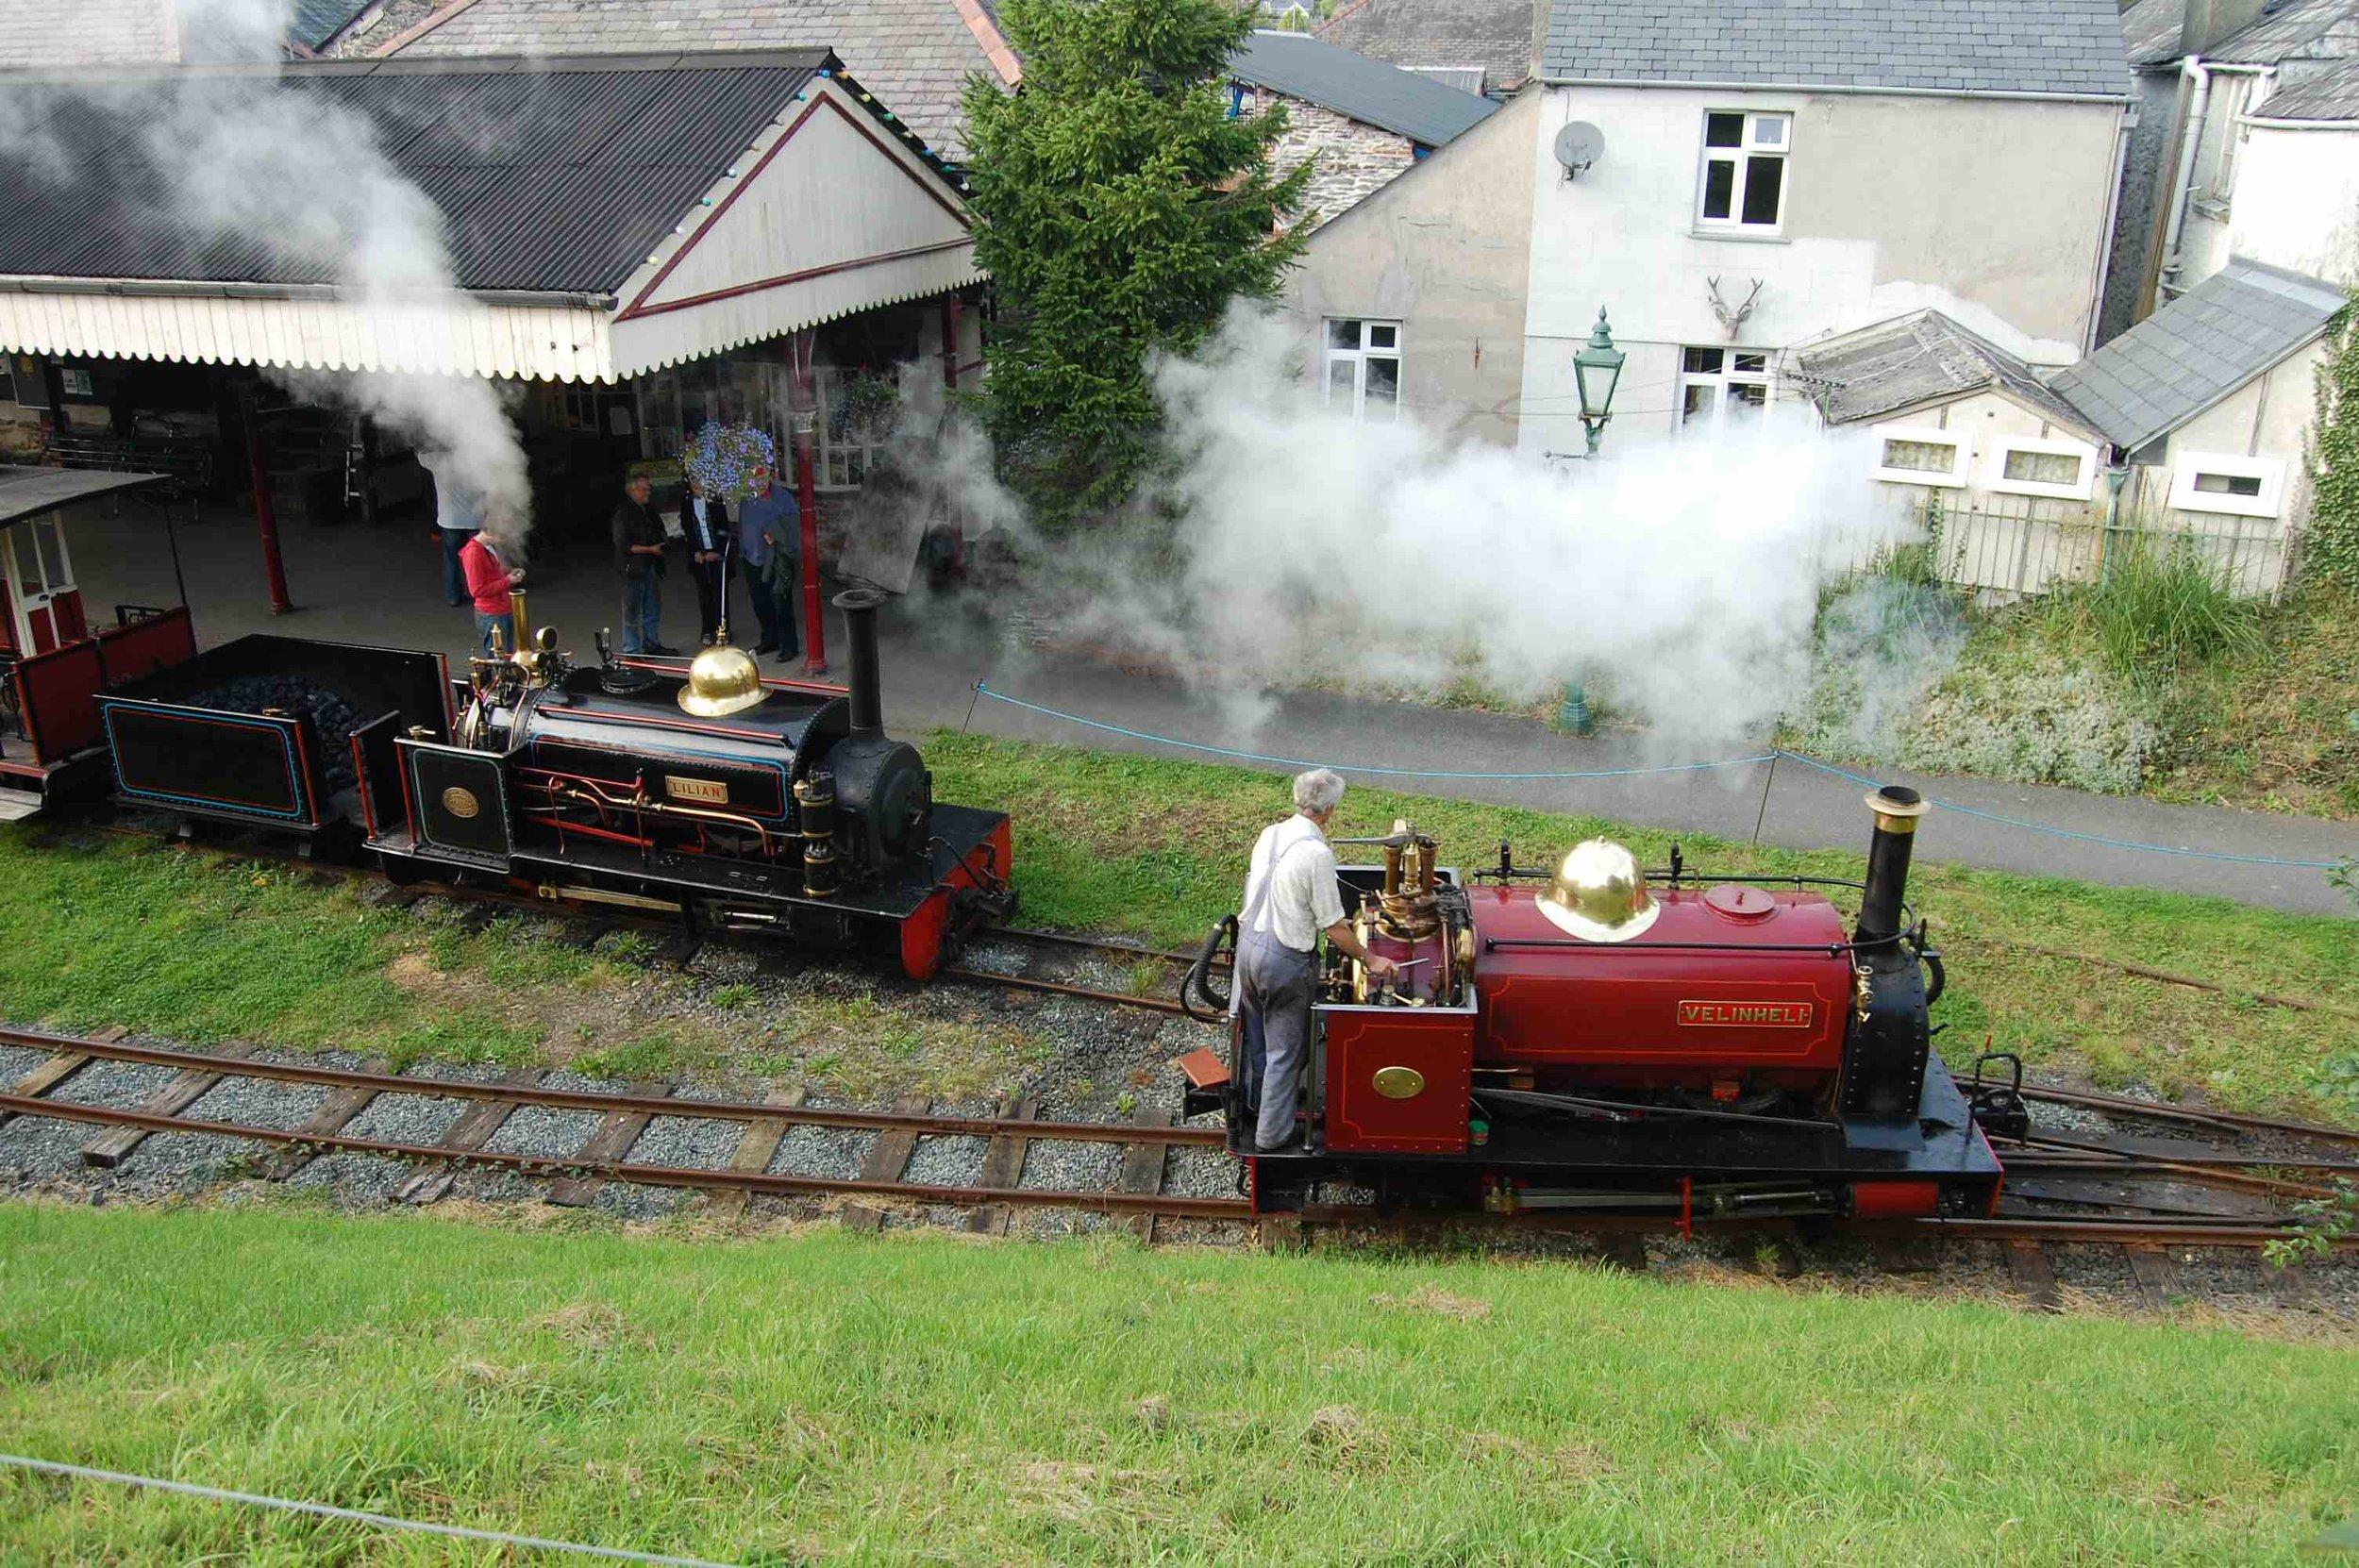 Launceston Steam Railway-based 'Quarry Hunslet' 0-4-0ST  Velinheli  runs round fellow resident  Lilian  at Launceston station on September 23 2011. STEVE RYSZKA